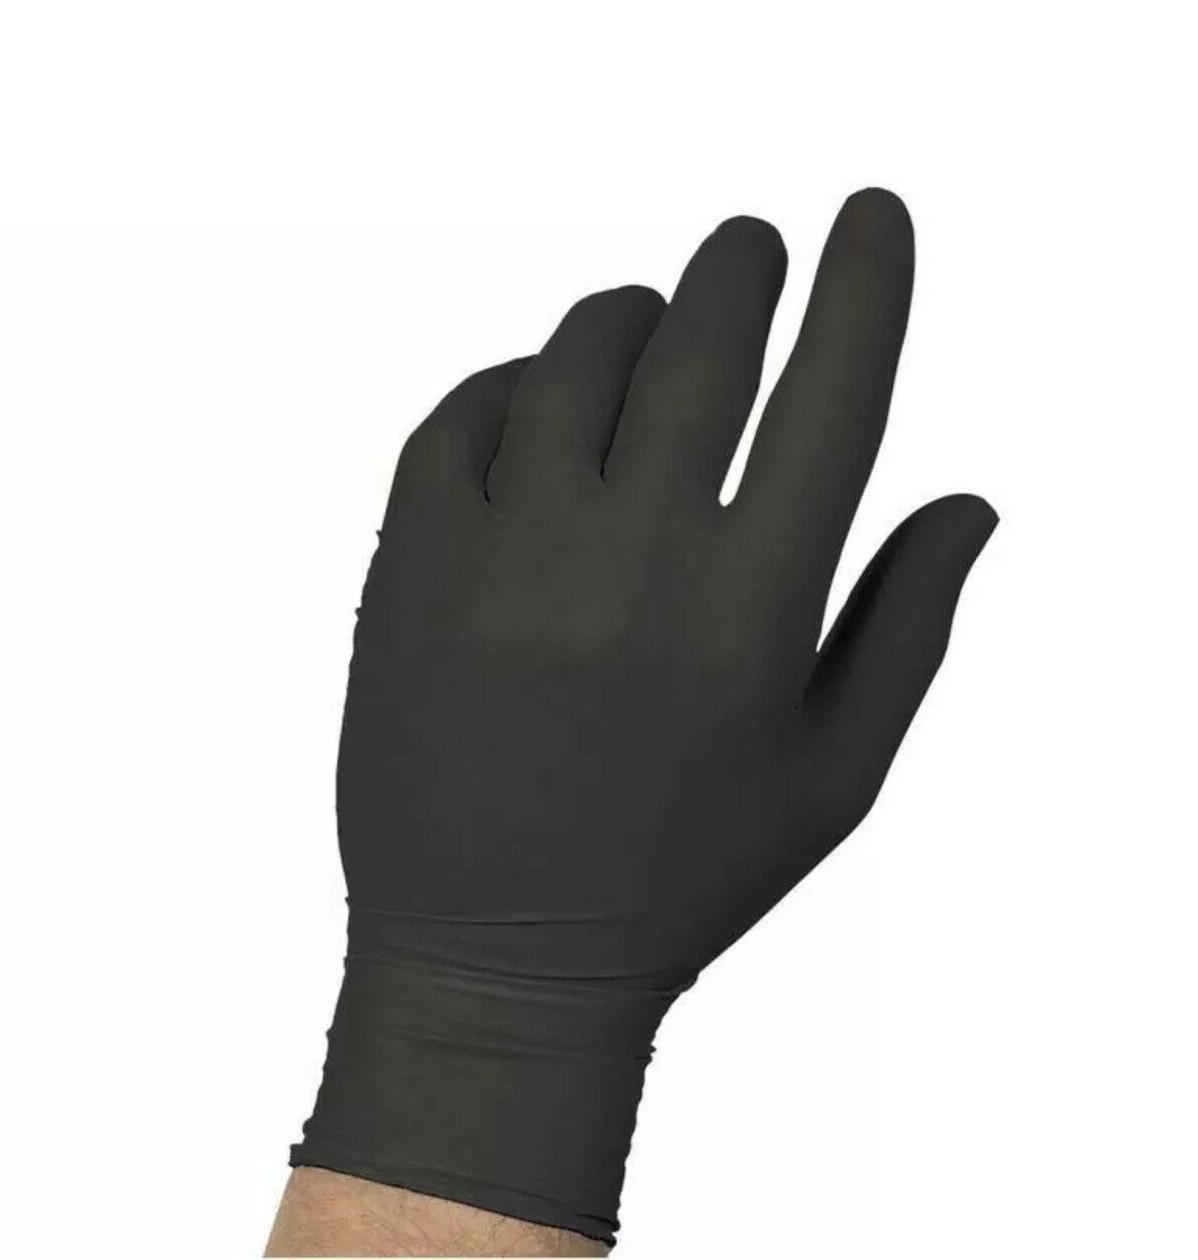 100 piece black nitrile rubber gloves latex